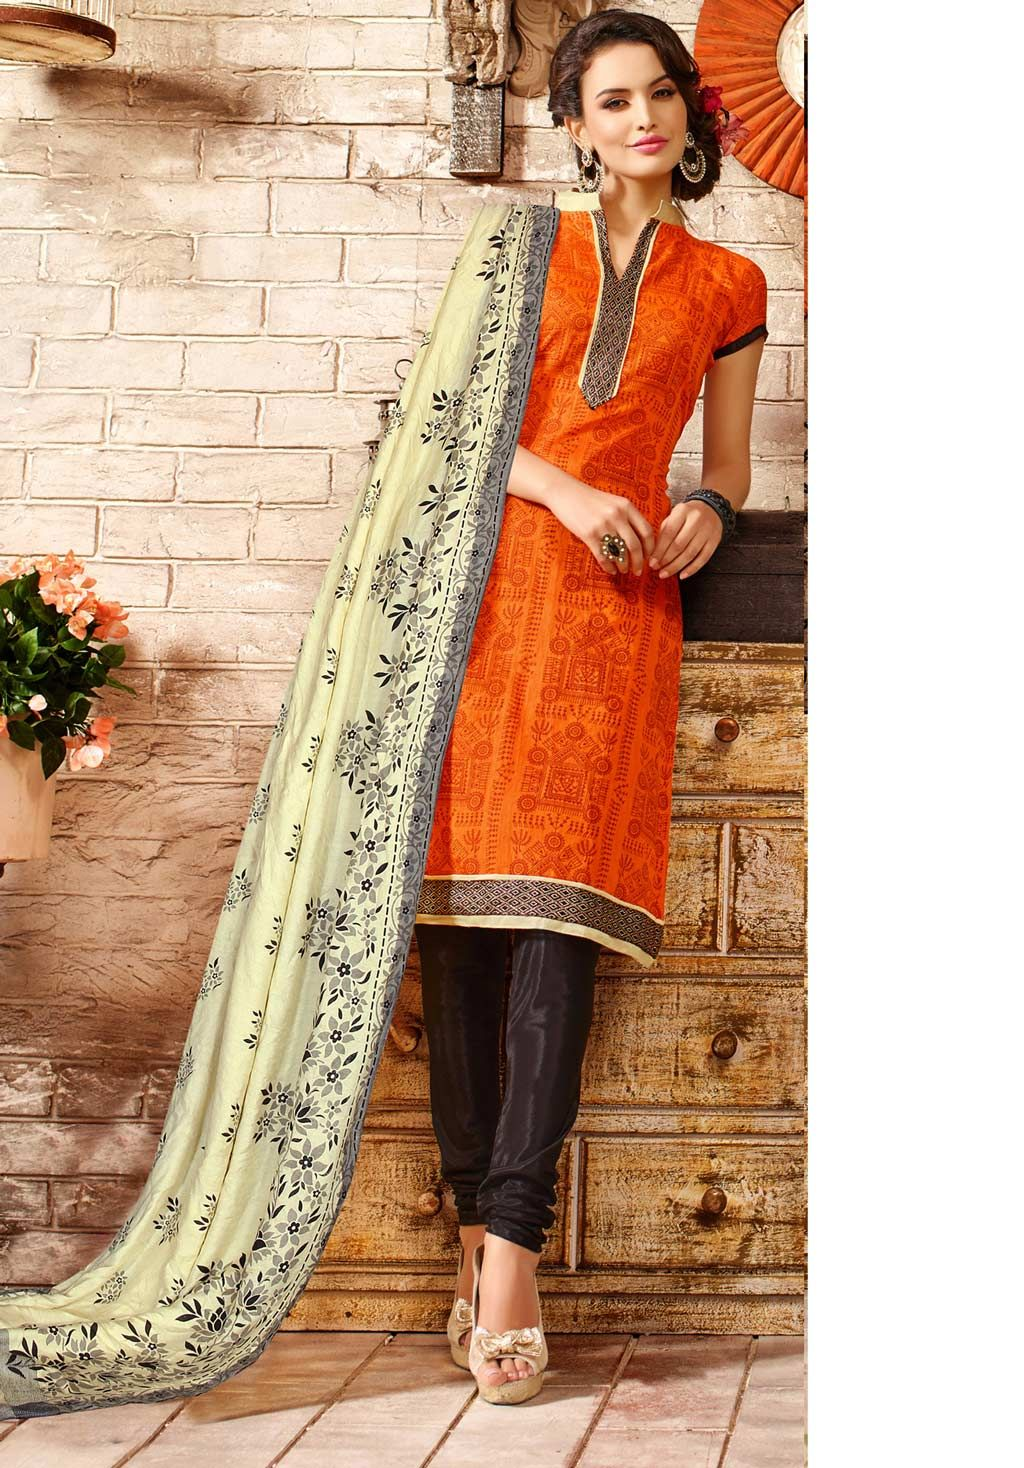 479335dfba Orange Chanderi Cotton Churidar Suit 60185 | Churidar Salwar Suit ...